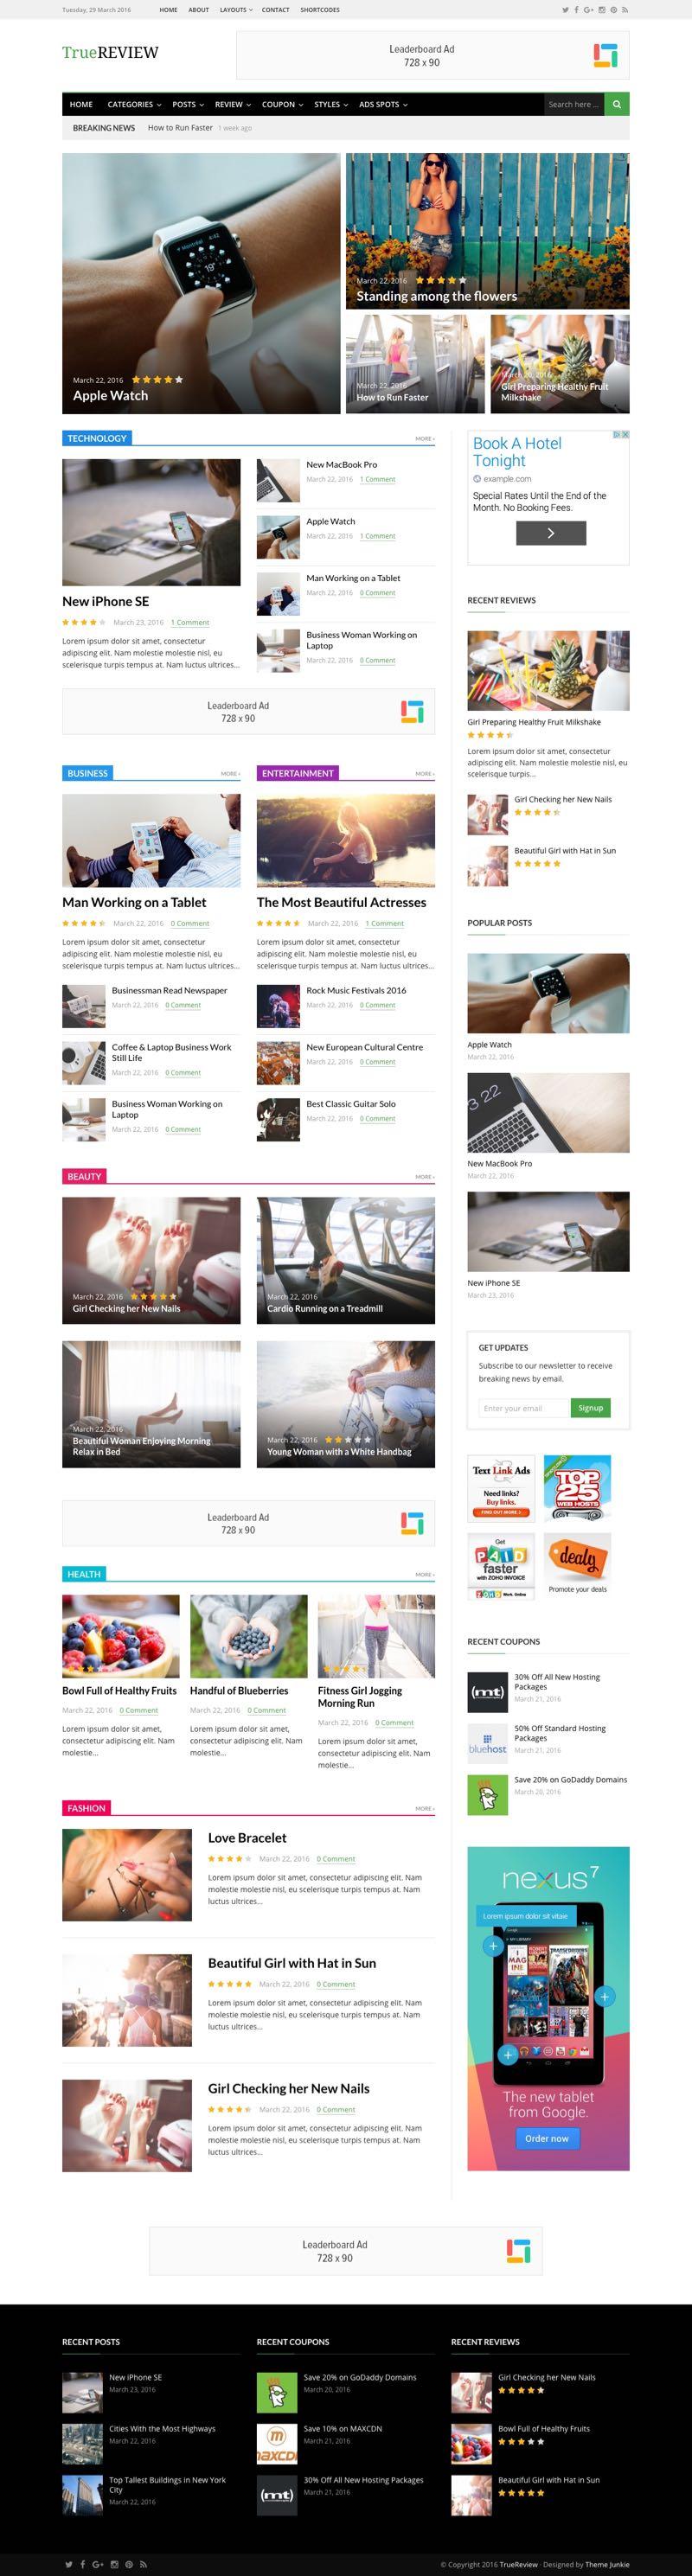 TrueReview WordPress Editorial Reviews Theme